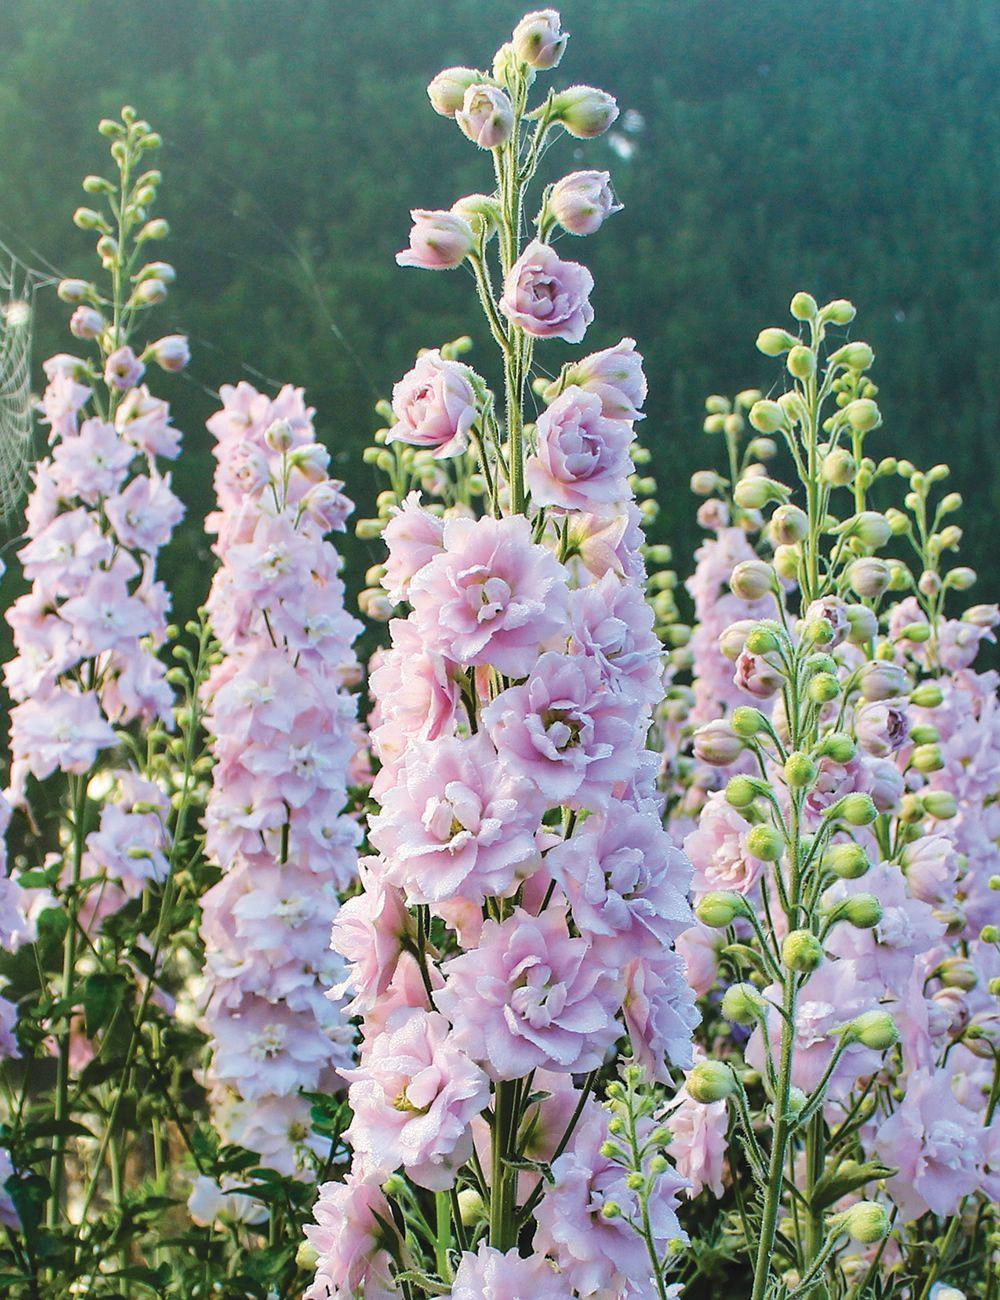 Dowdeswell Delphiniums Pink Blush Tesselaar Delphinium Delphinium Flower Garden Beautiful Flowers